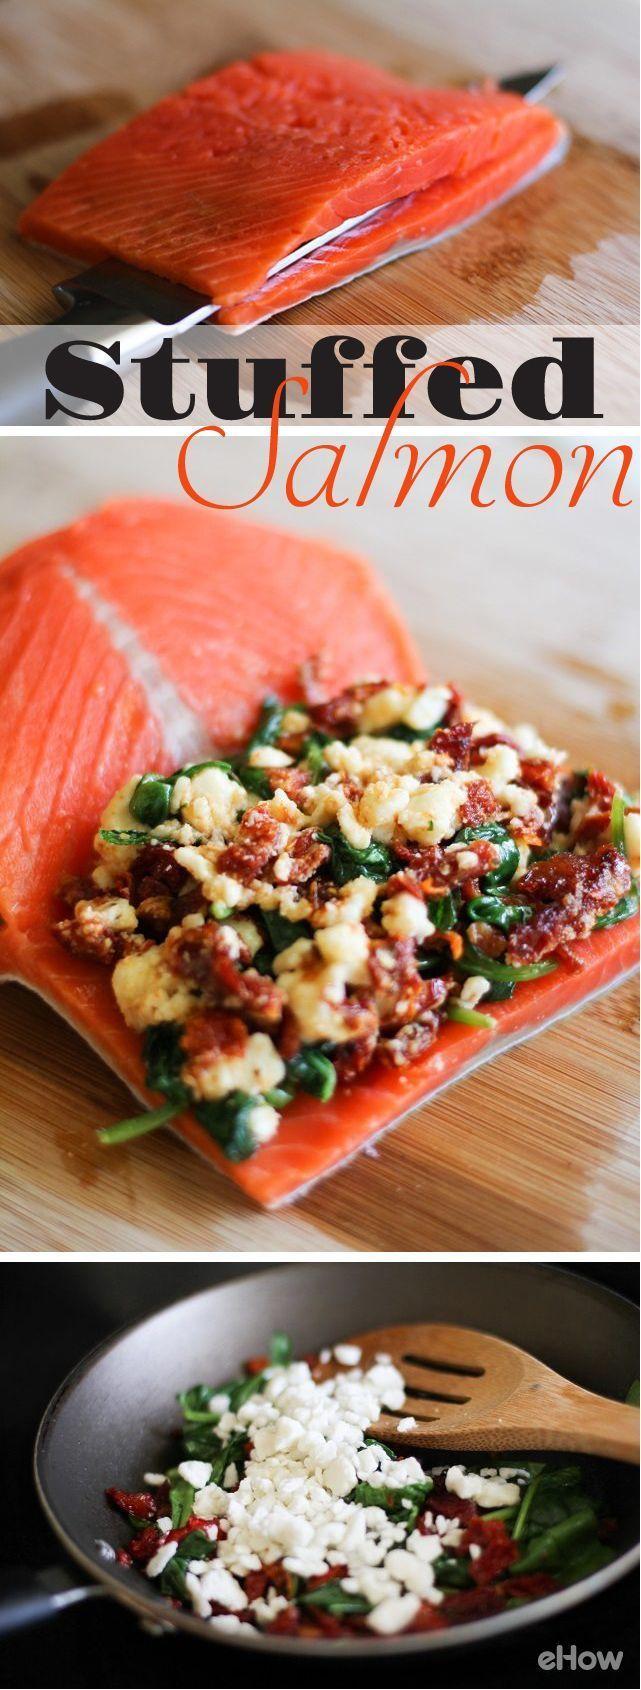 How To Cook Stuffed Salmon